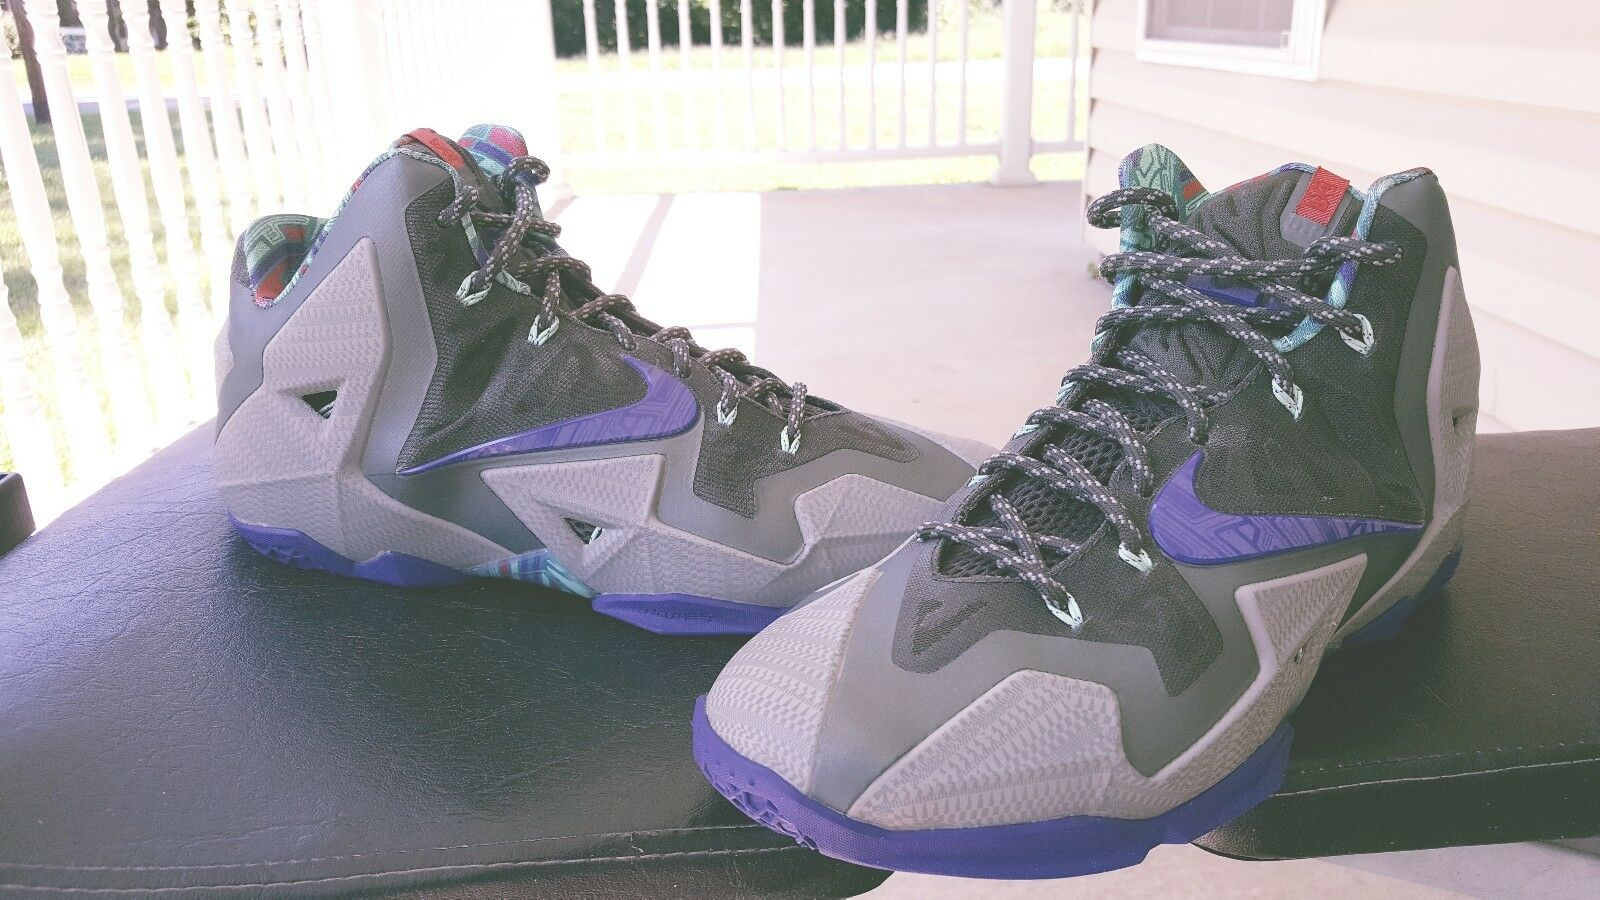 Nike Lebron James 10 size 10.5 terracotta  mint condition